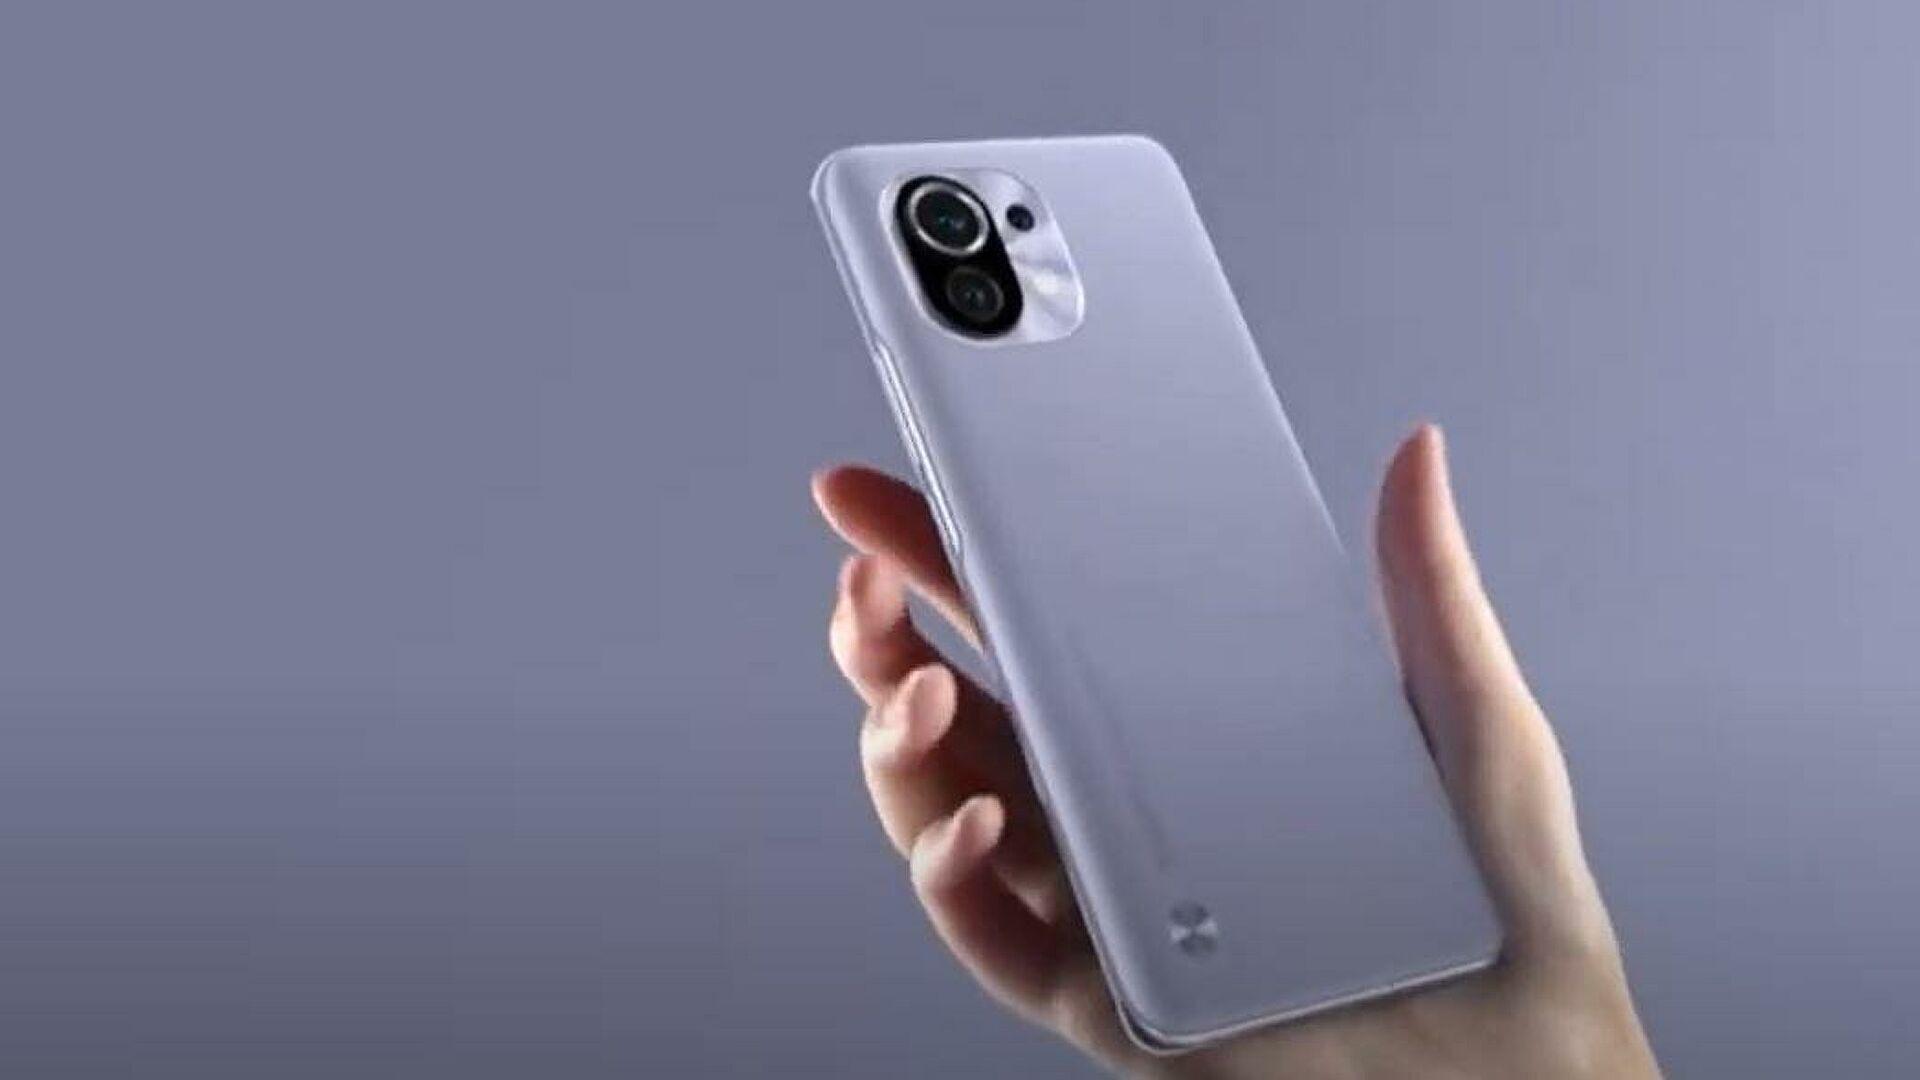 Xiaomi Mi 11 сравнили с iPhone 12 Pro Max по скорости работы в сети Wi-Fi